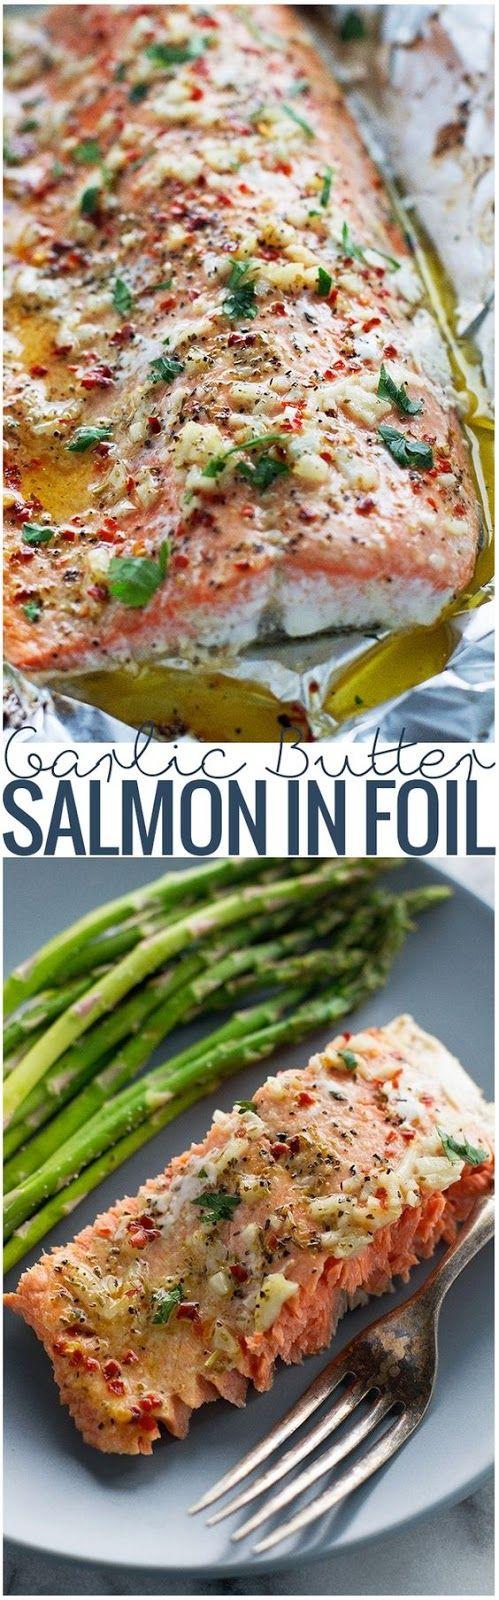 INGREDIENTS:   1 ¼ pound sockeye or coho salmon (preferably wild caught)*   2 tablespoons lemon juice   2 cloves garlic, minced   2 tab...